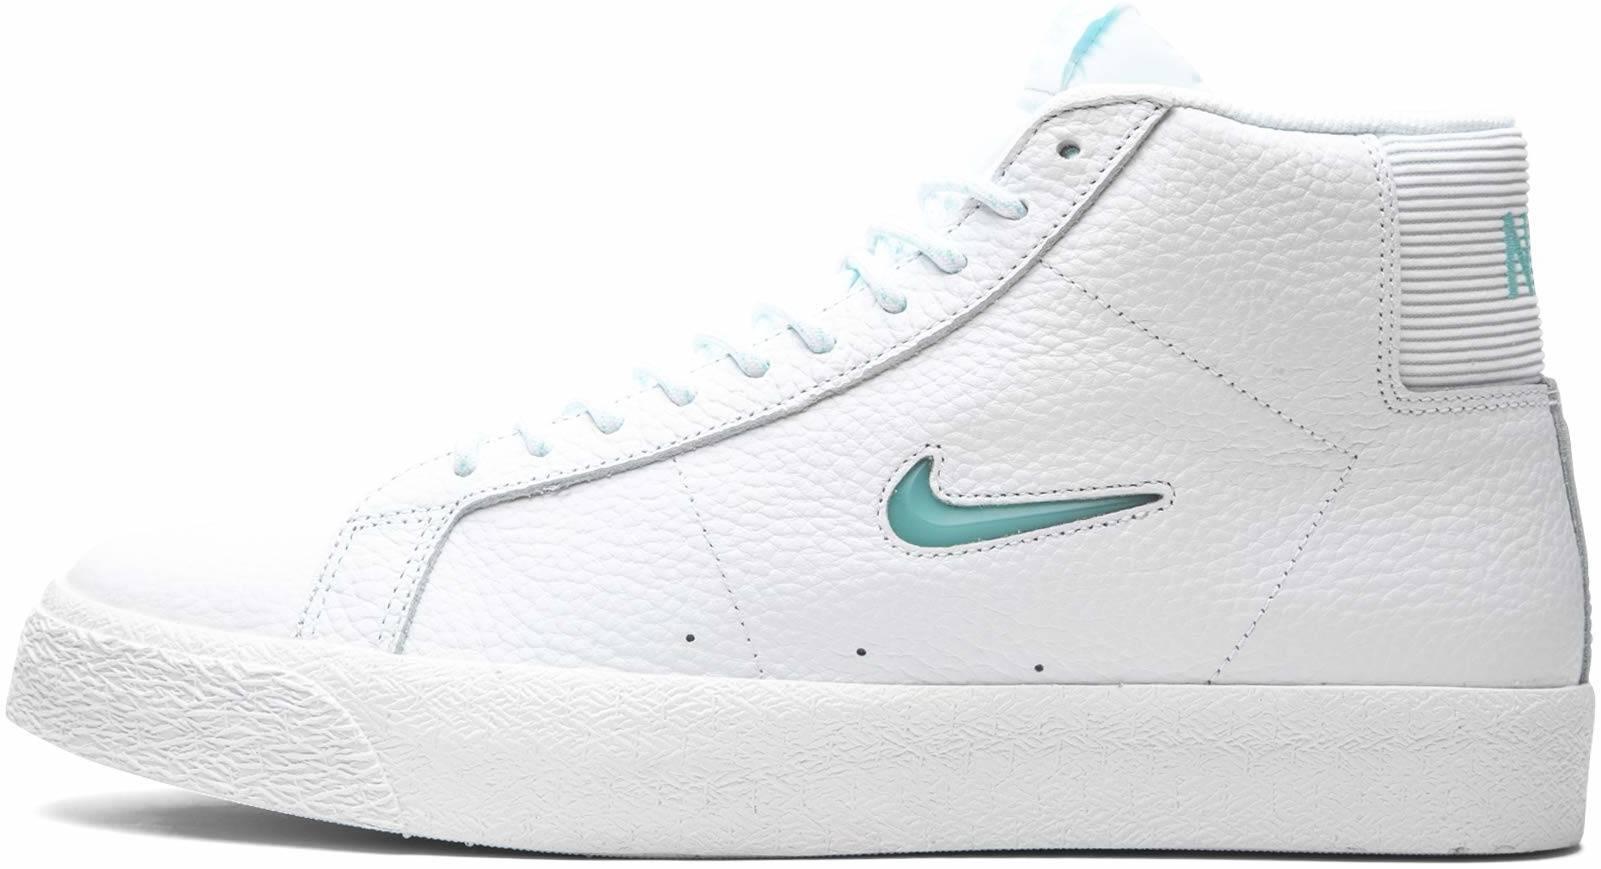 Nike SB Zoom Blazer Mid Premium sneakers in white | RunRepeat